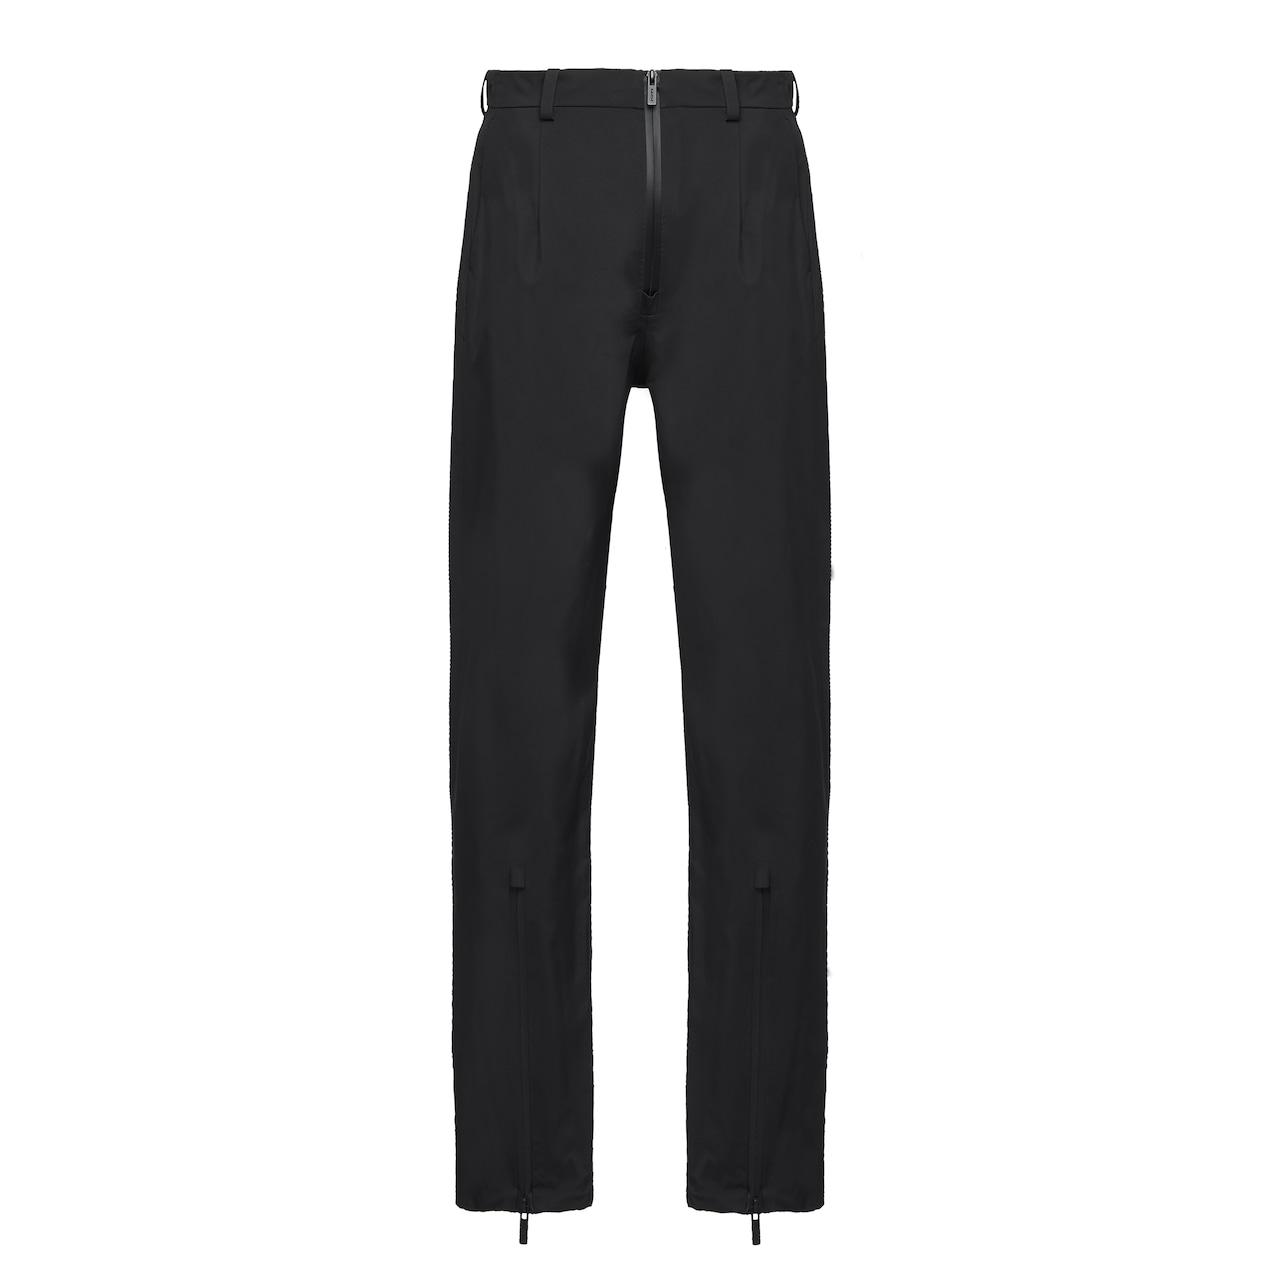 Prada LR-MX013 professional technical fabric trousers 1